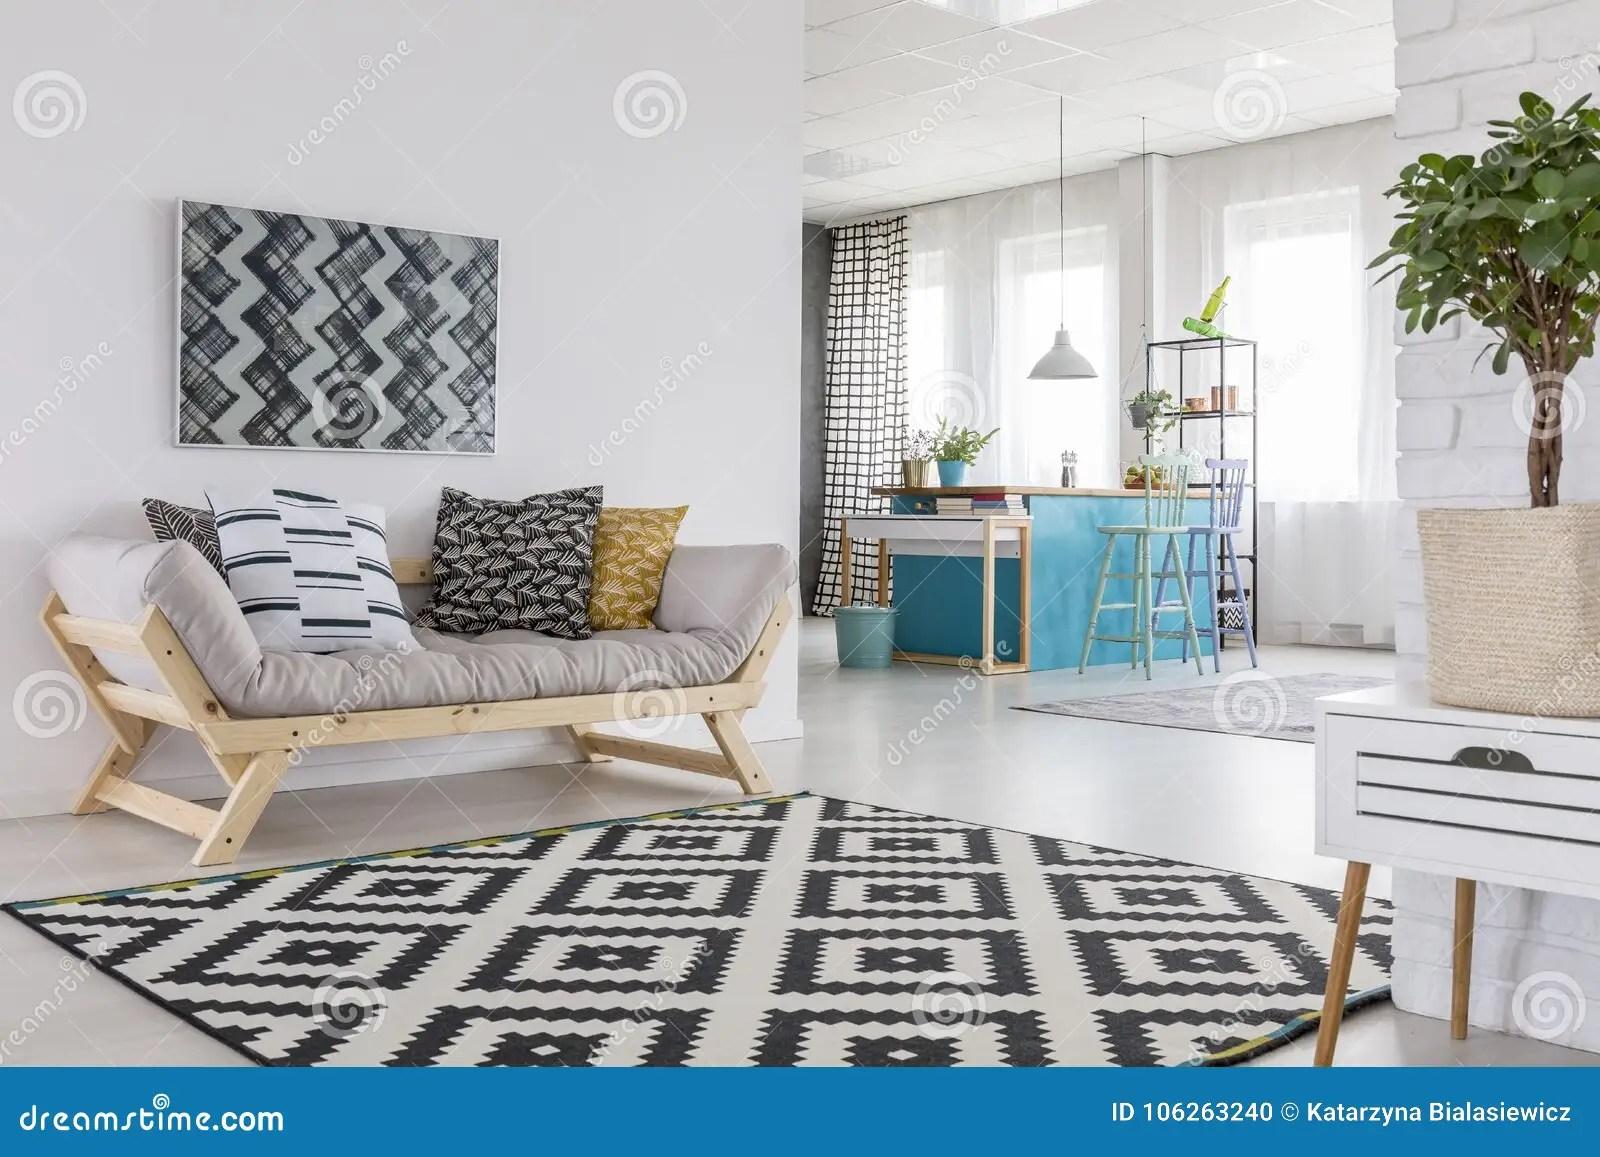 blue kitchen rugs cabinet handle 被仿造的地毯在客厅库存照片 图片包括有仿造 枕头 内部 投反对票 在客厅内部的被仿造的地毯与木沙发 植物内阁的和蓝色小厨房在背景中